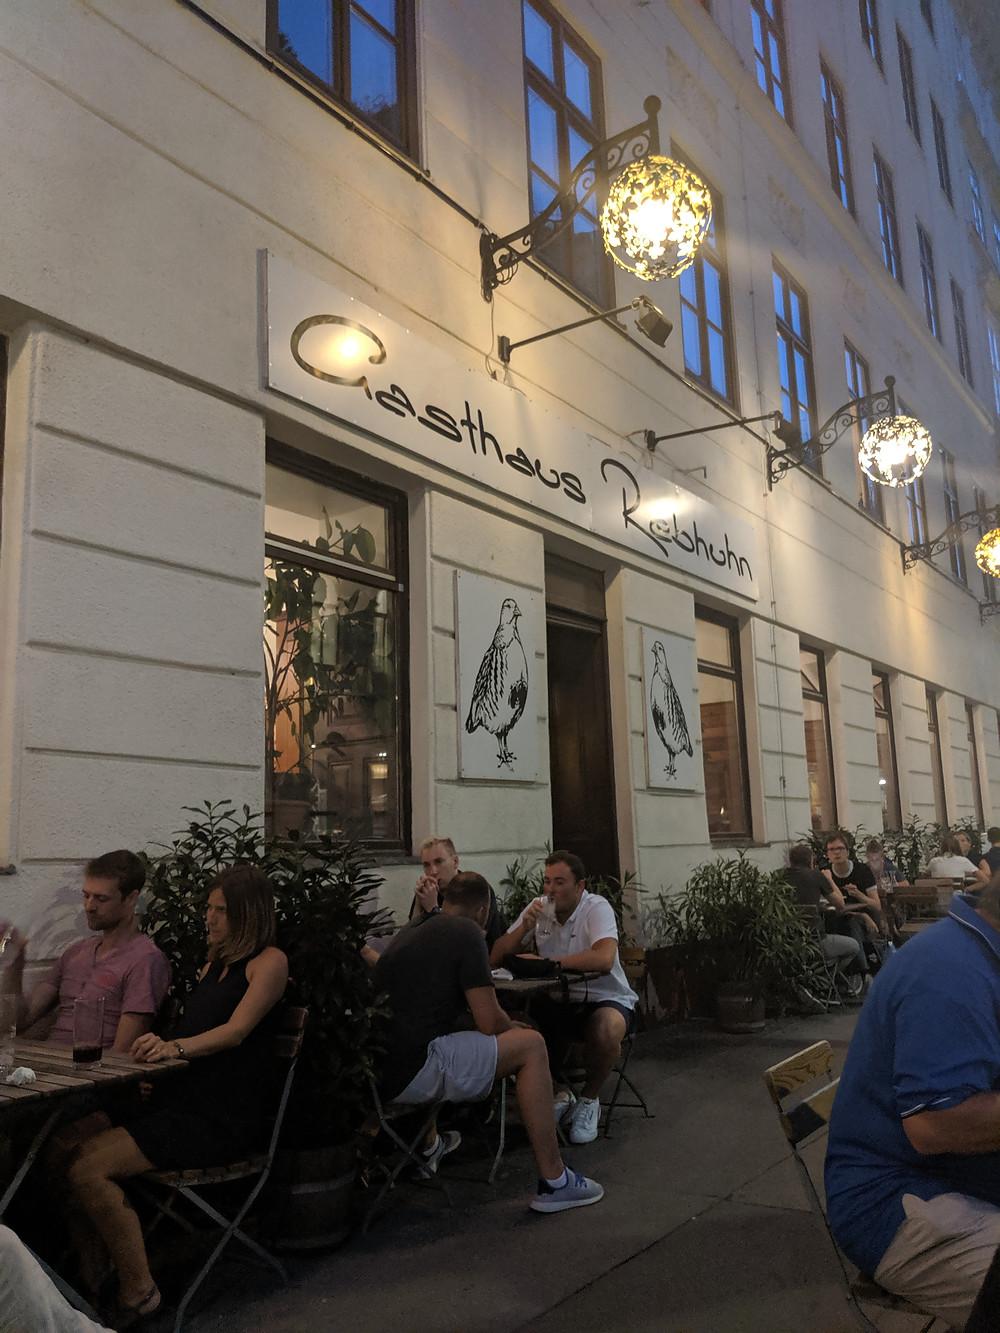 Wonderful outdoor seating area at Gasthaus Rebhuhn.